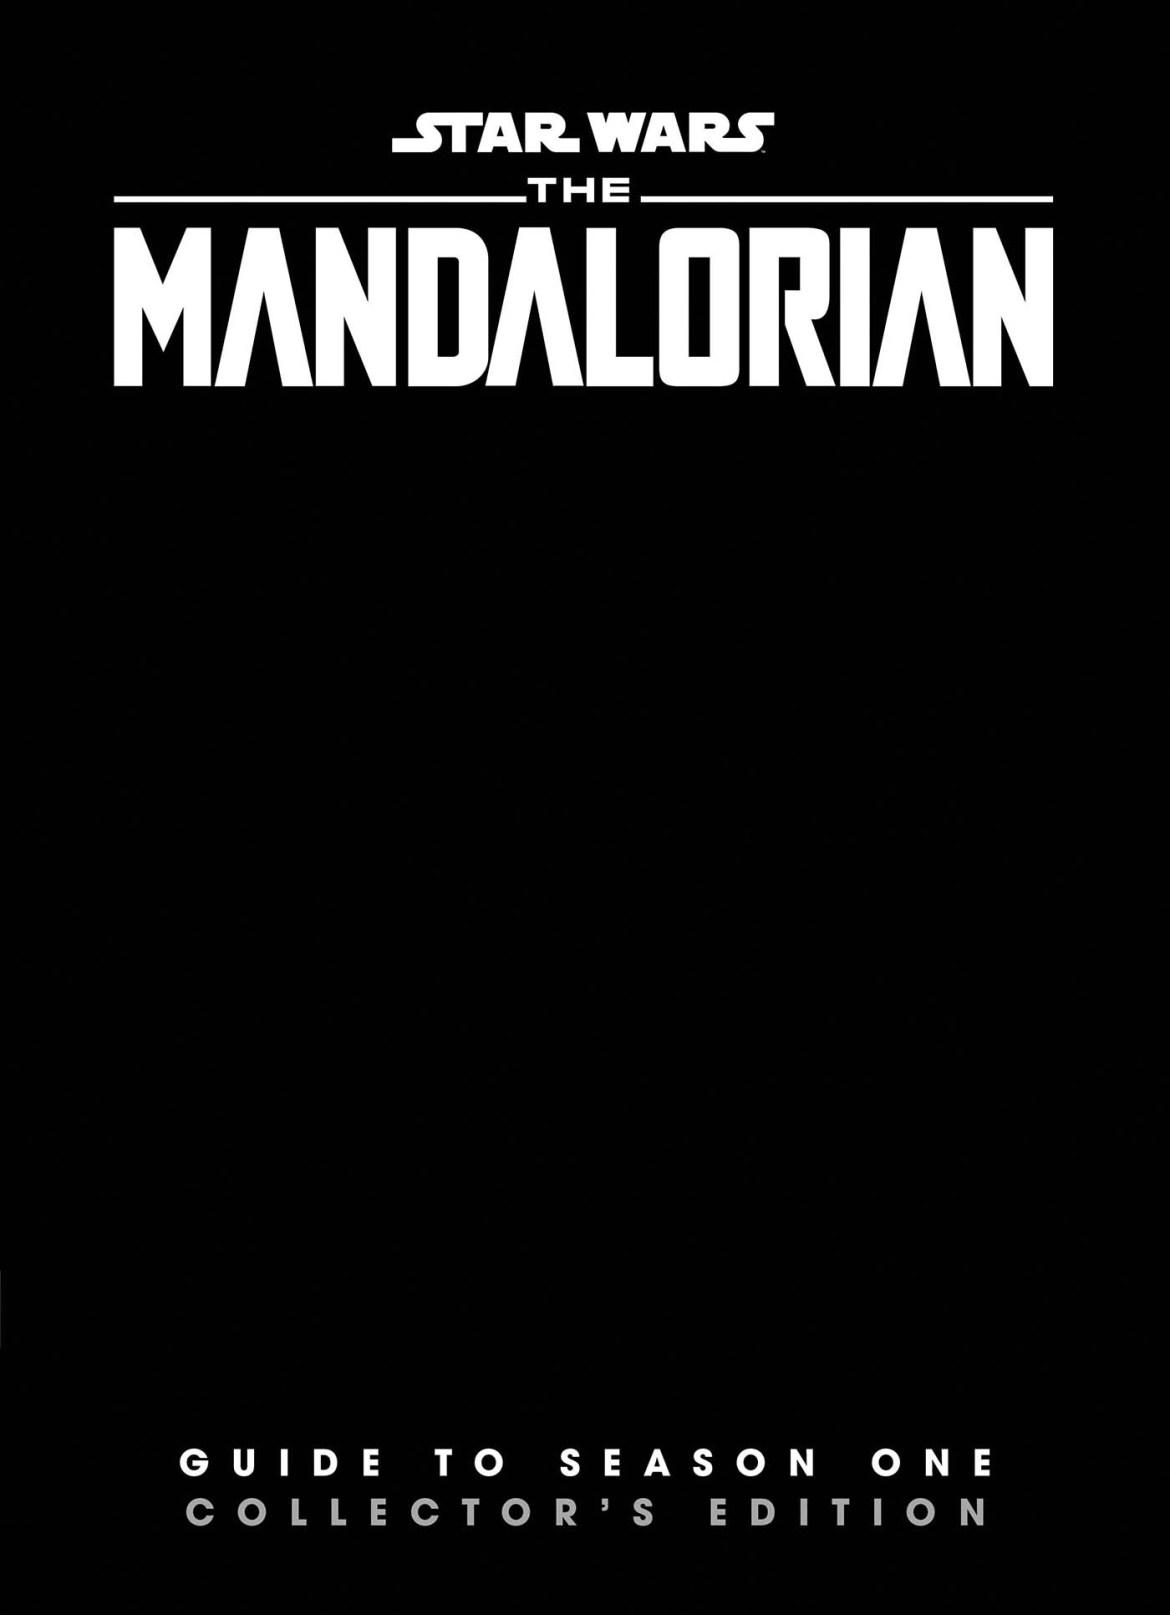 The_Making_of_Mandalorian_Season1_Sales_C0ver Titan Comics March 2021 Solicitations